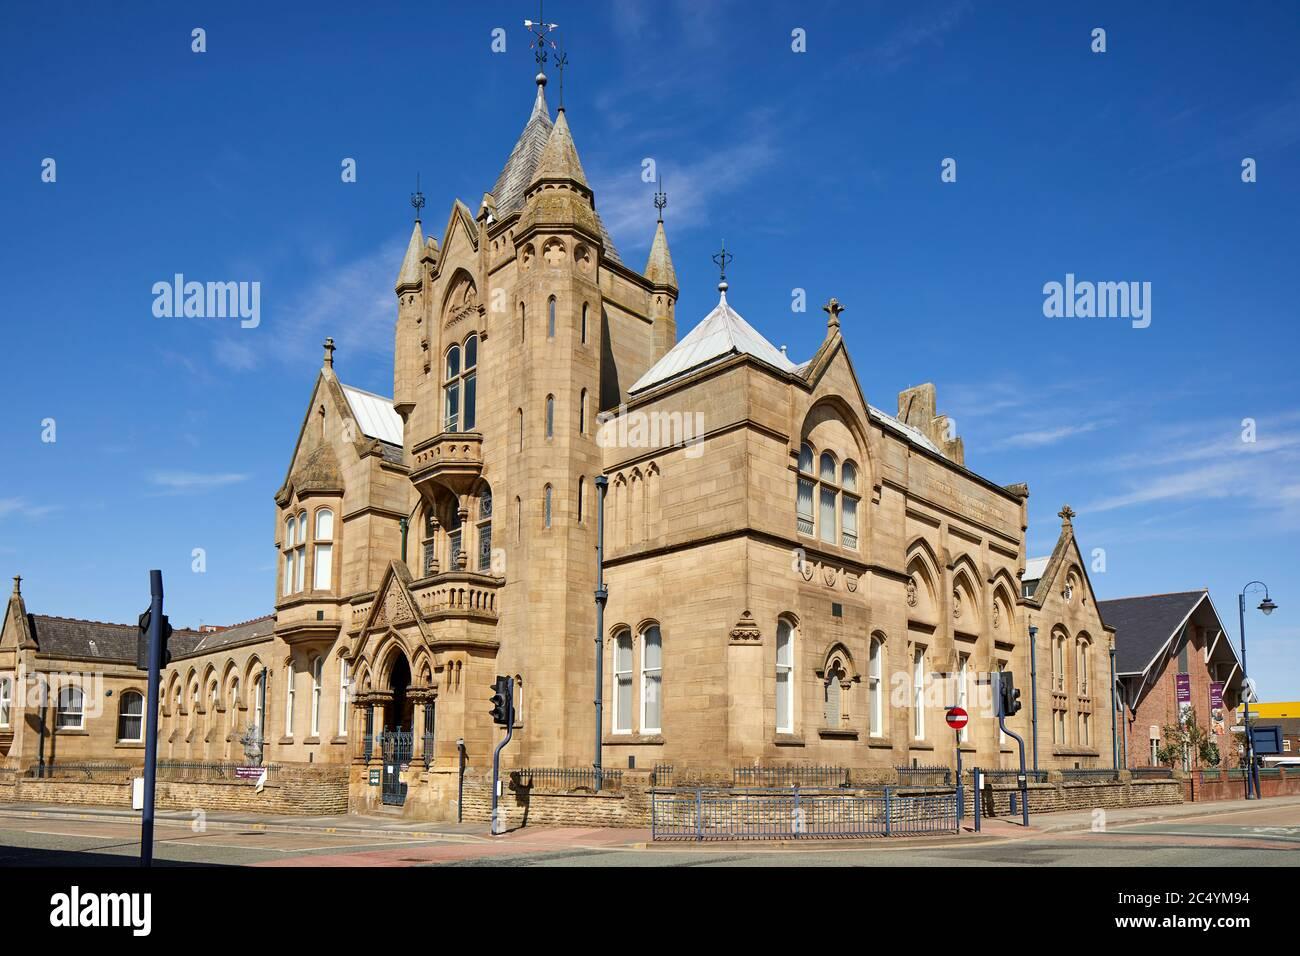 Ashton-under-Lyne town centre Tameside Public Library large stone gothic landmark buildingon Old Street Stock Photo